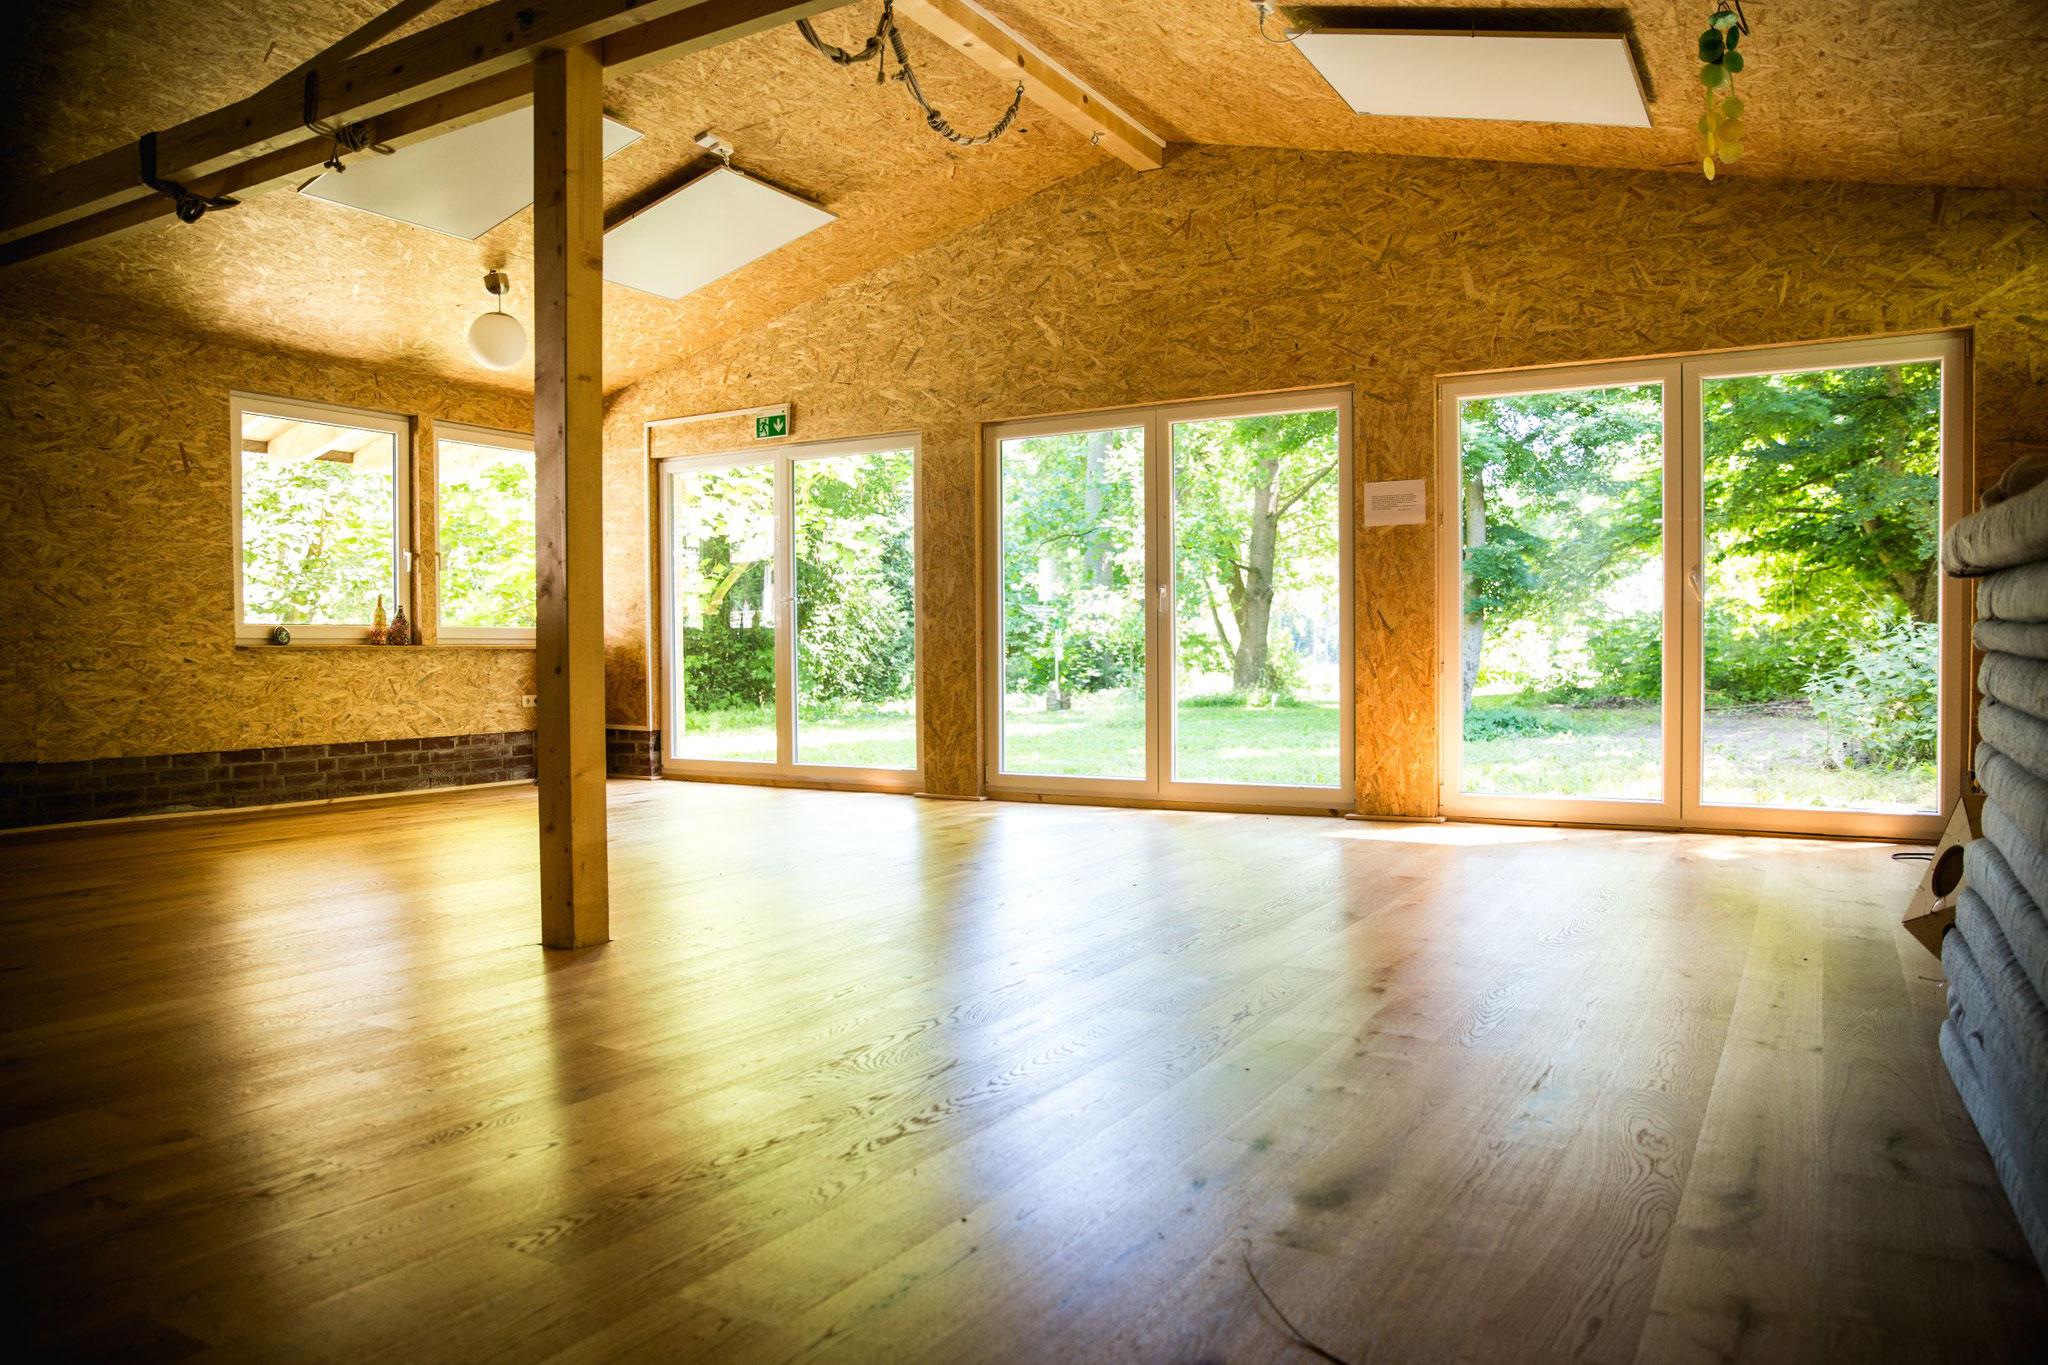 Yoga indoor mit Blick ins Grüne